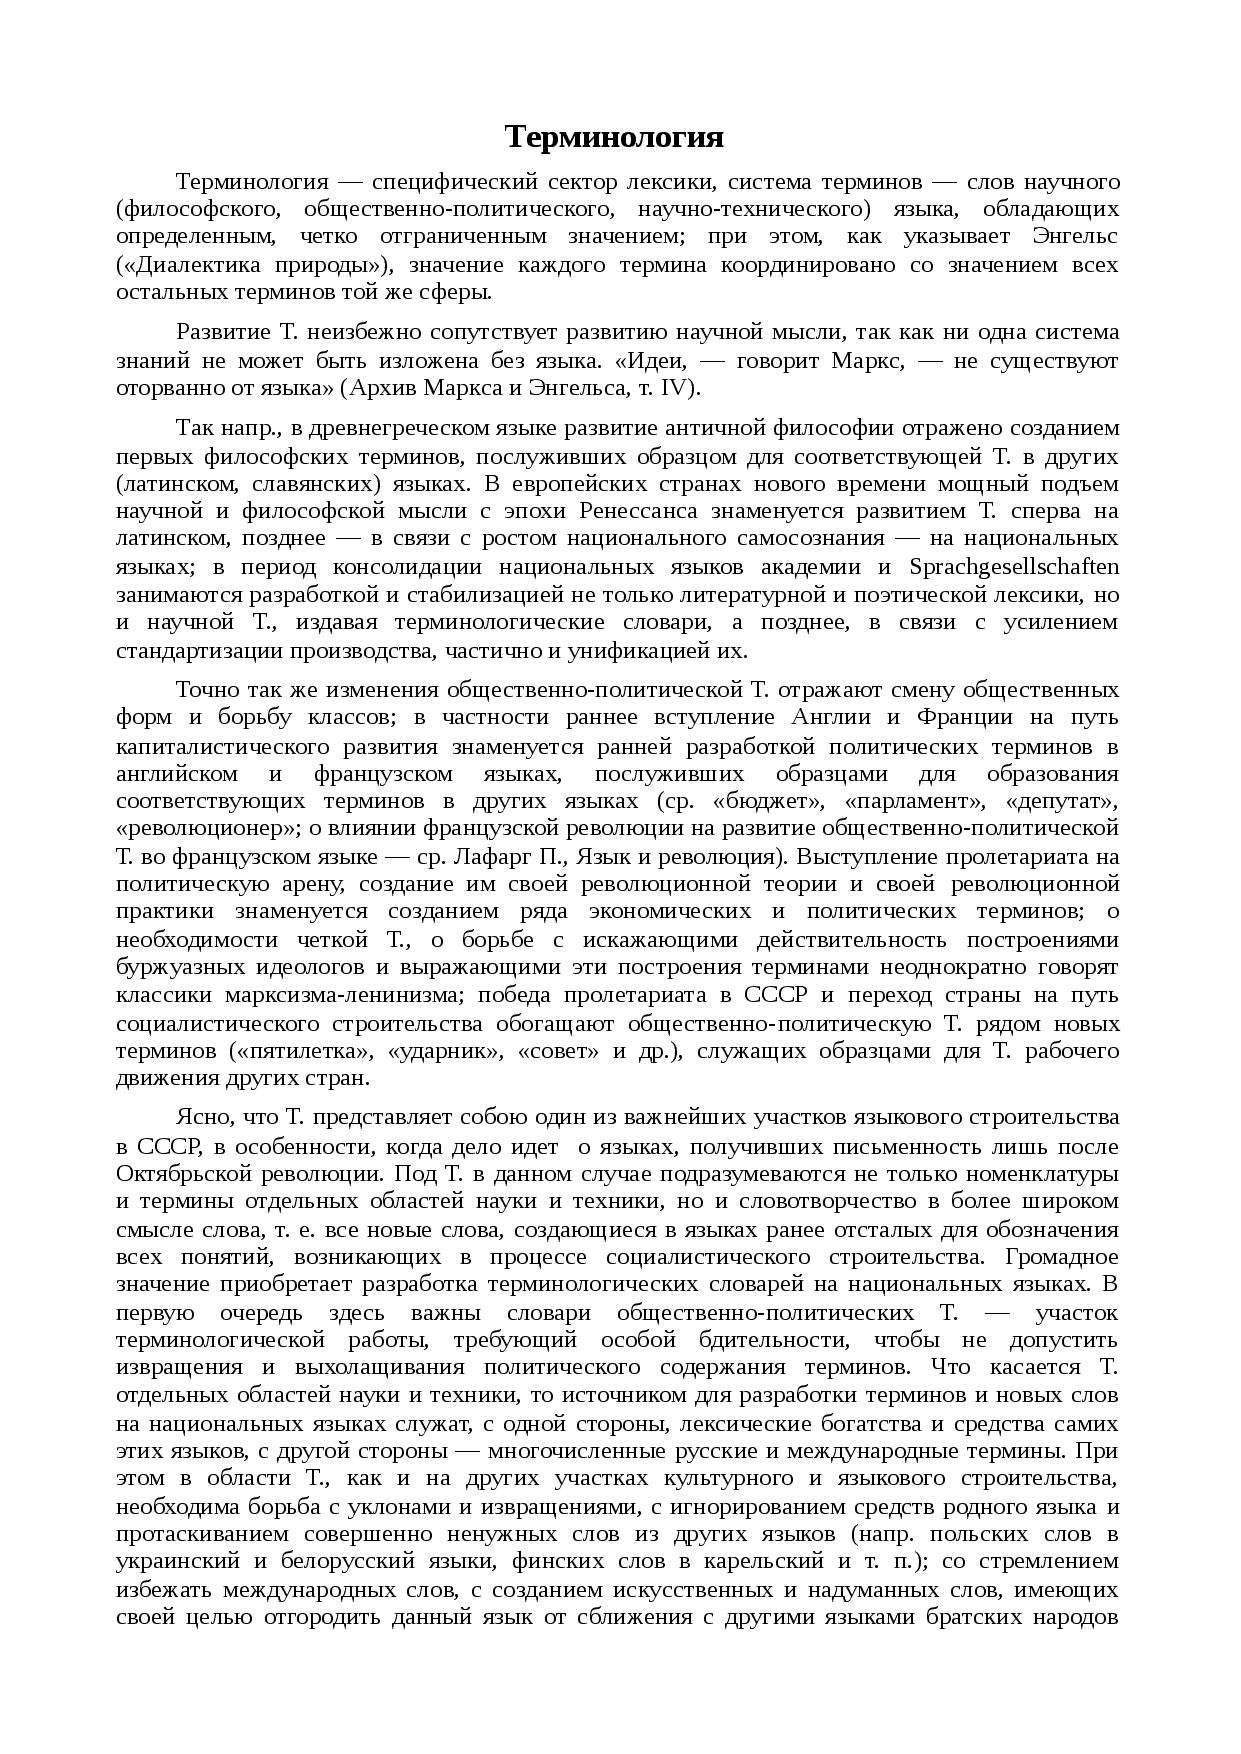 Рп термины гта самп: малиновка рп, радмир рп, крмп